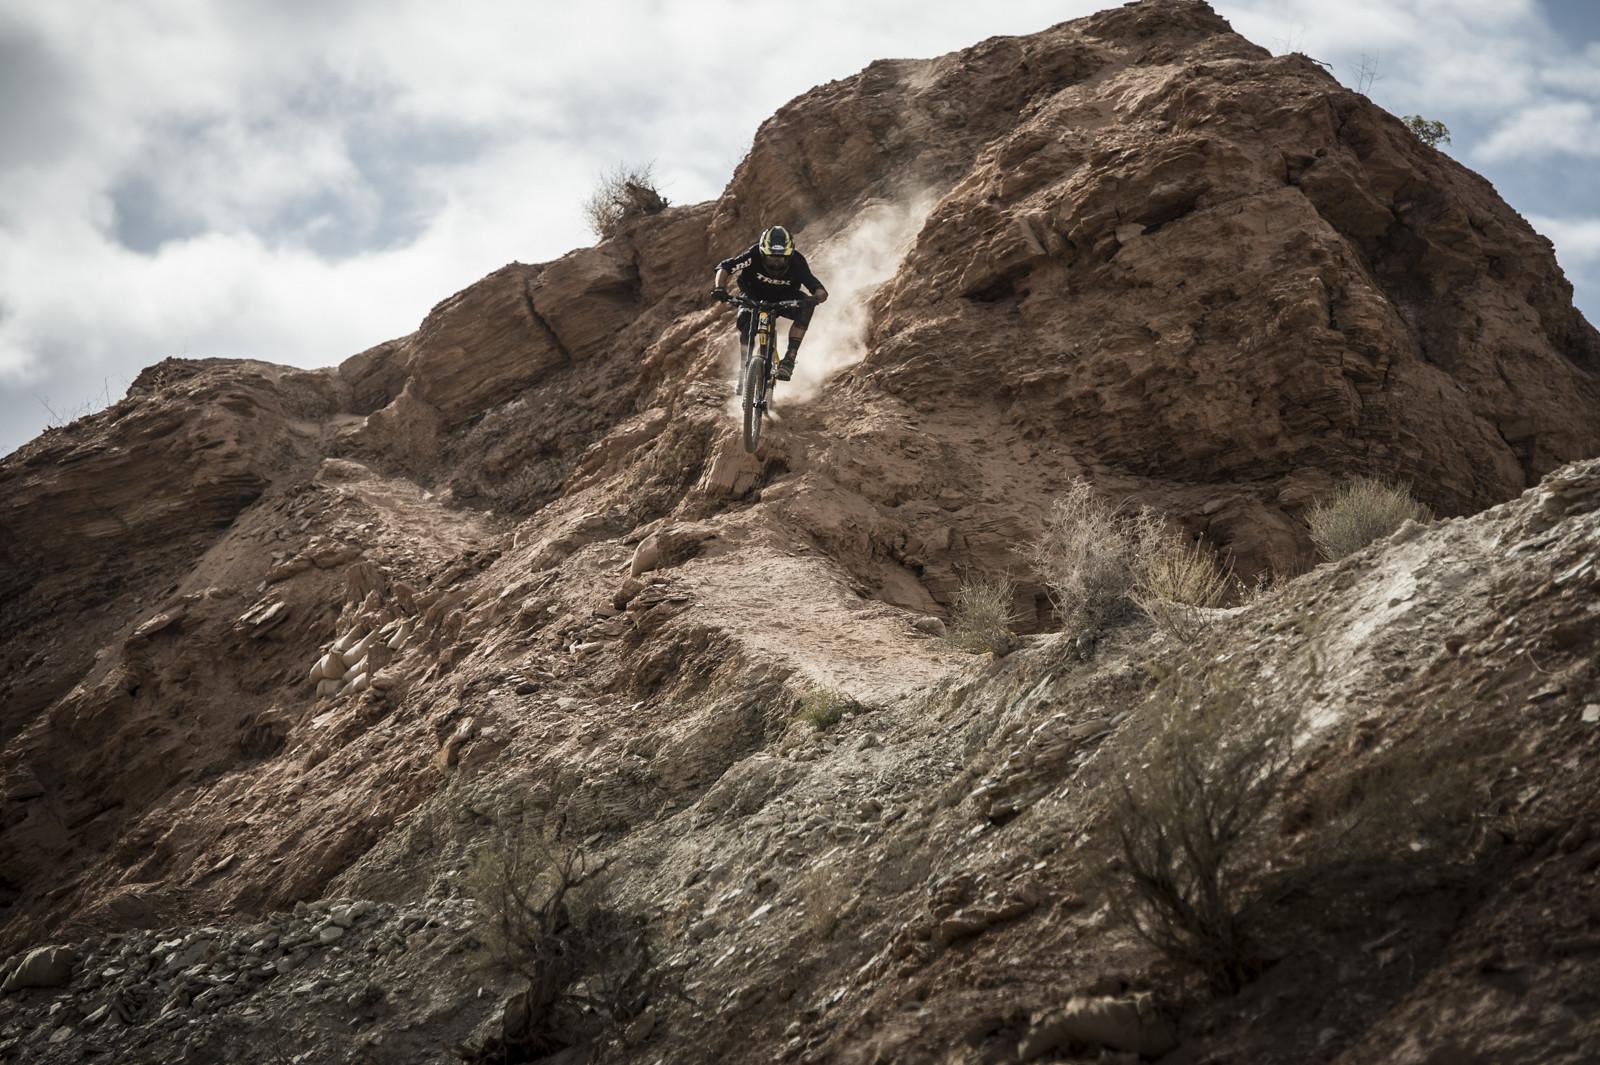 Ryan Howard - 2015 Red Bull Rampage Finals - Mountain Biking Pictures - Vital MTB